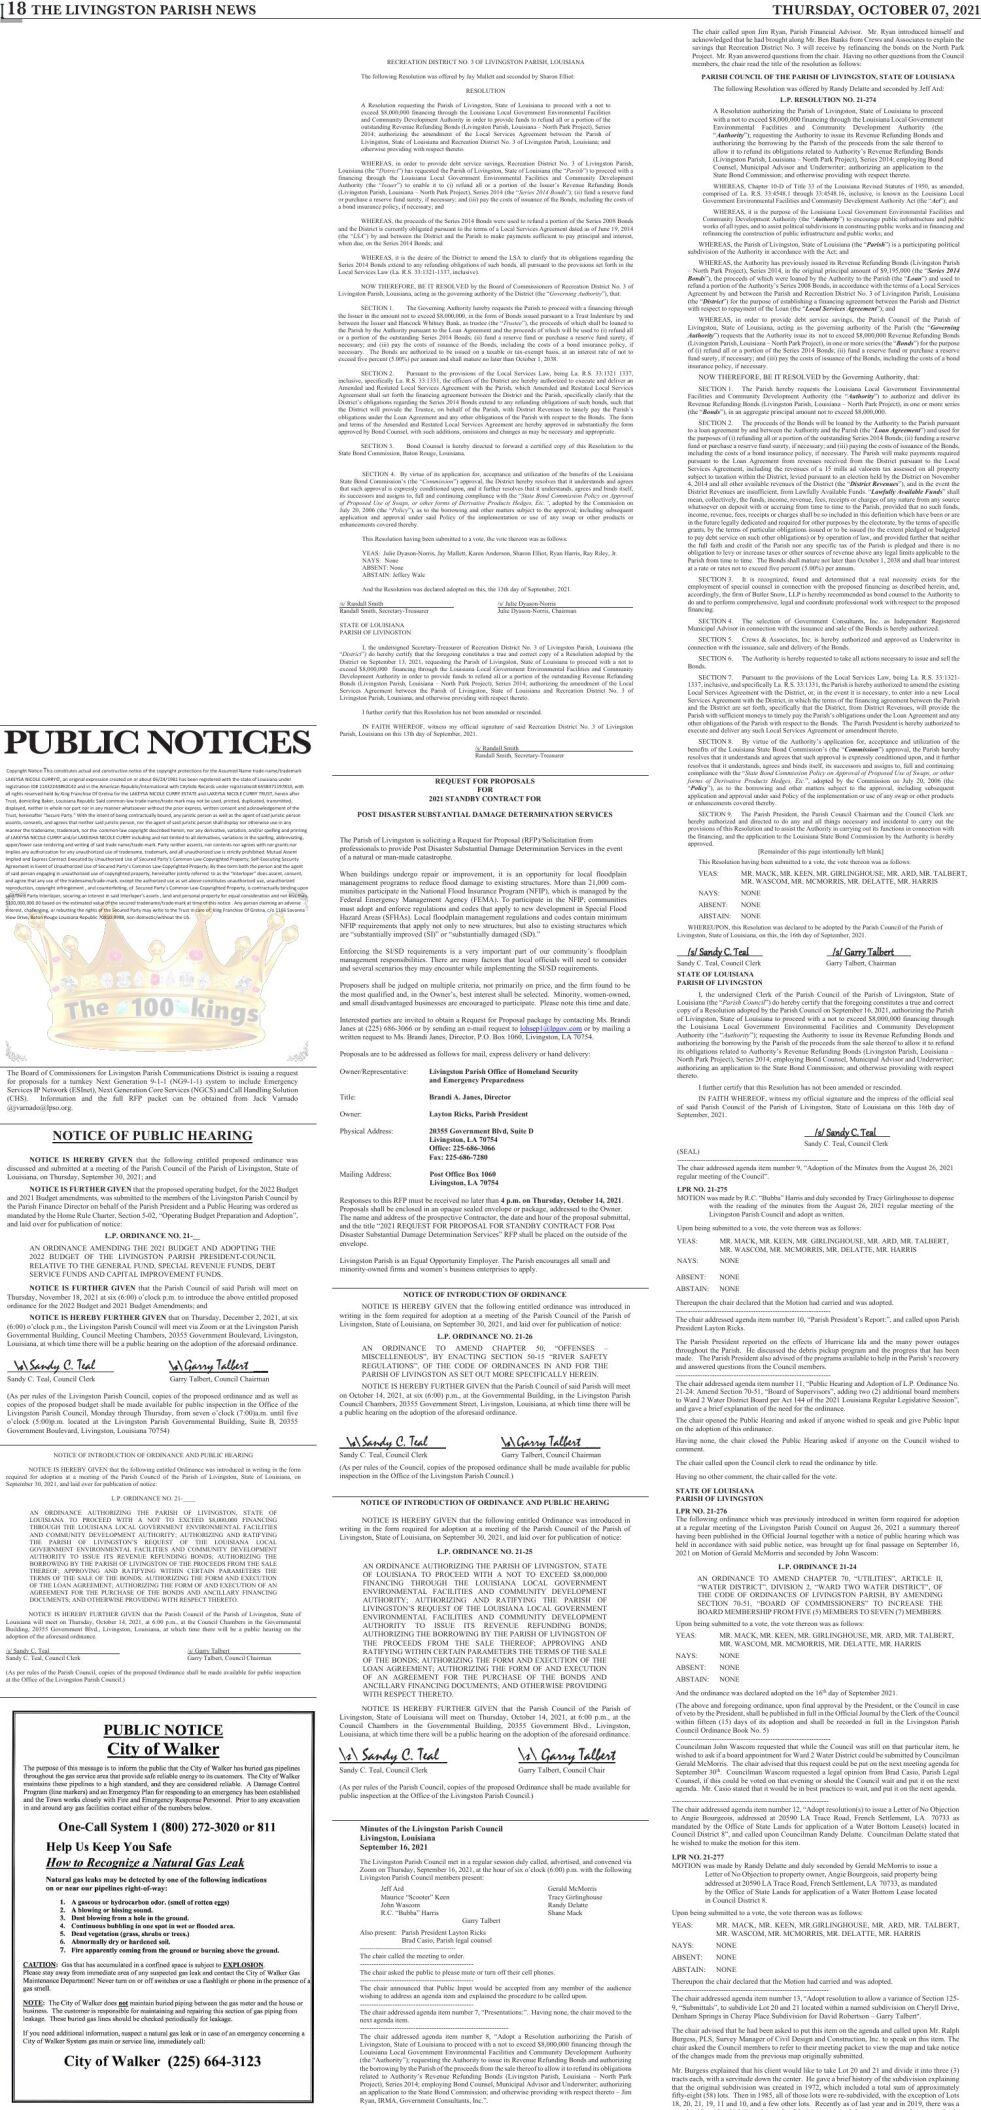 Public Notices published October 07, 2021